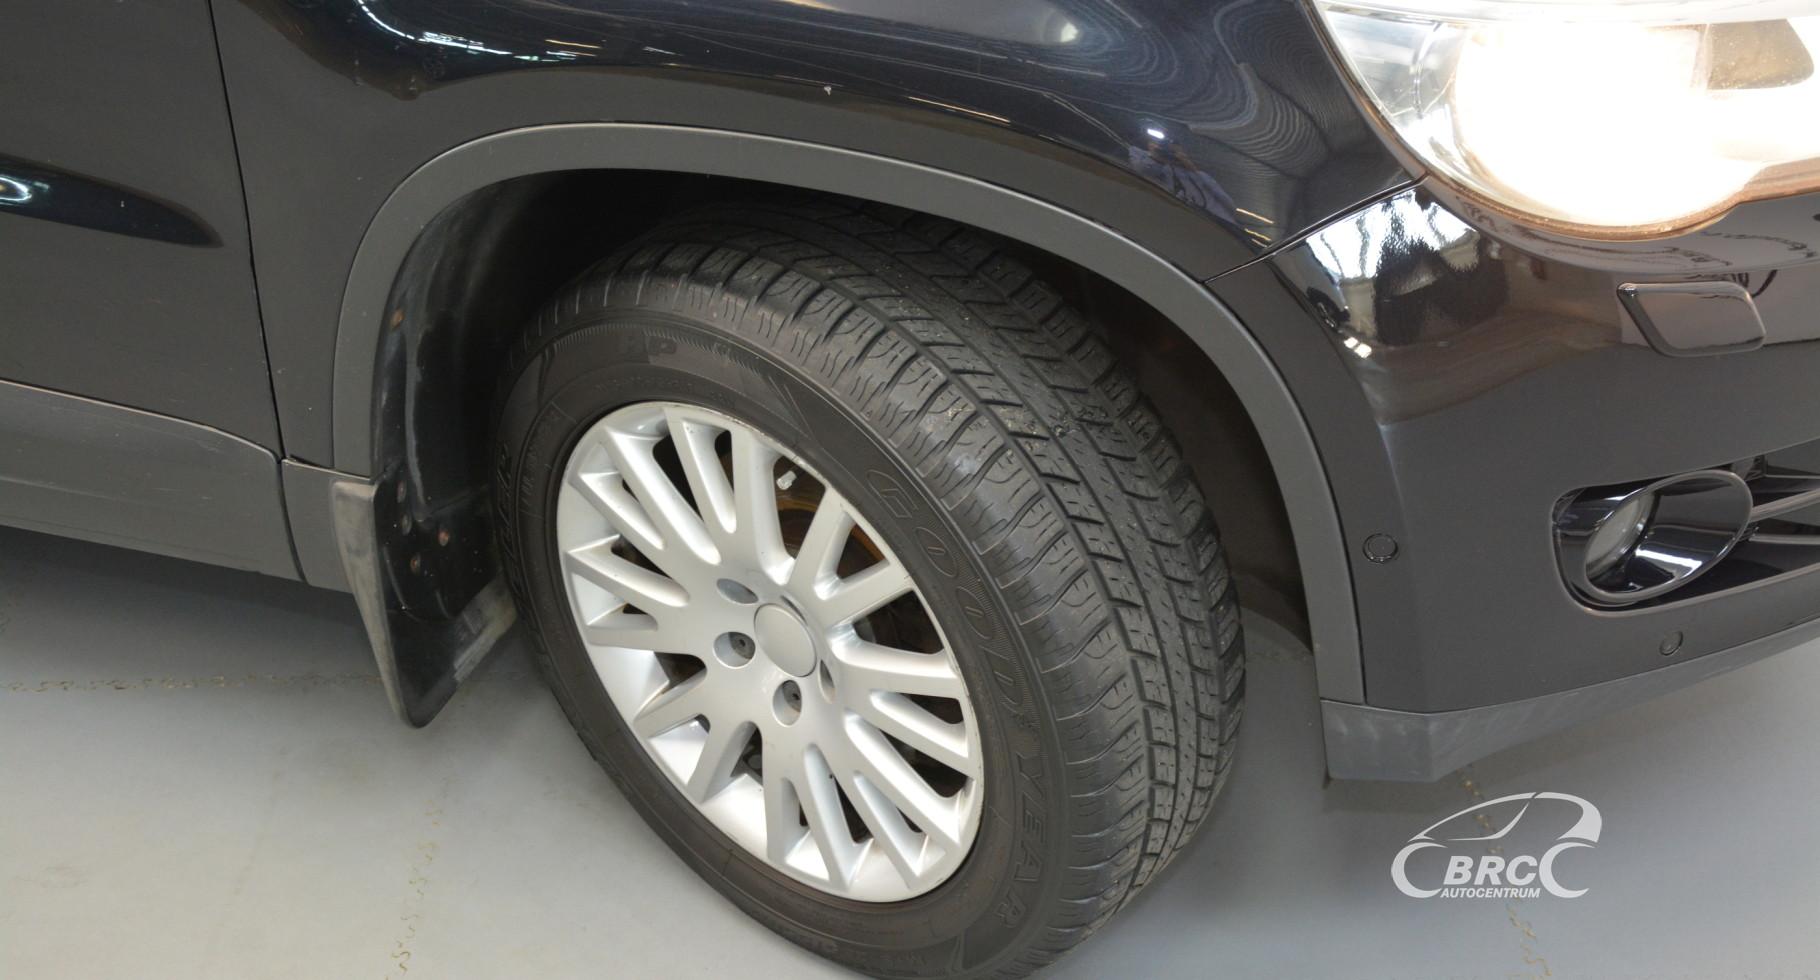 Volkswagen Tiguan 2.0 TSI 4Motion Automatas